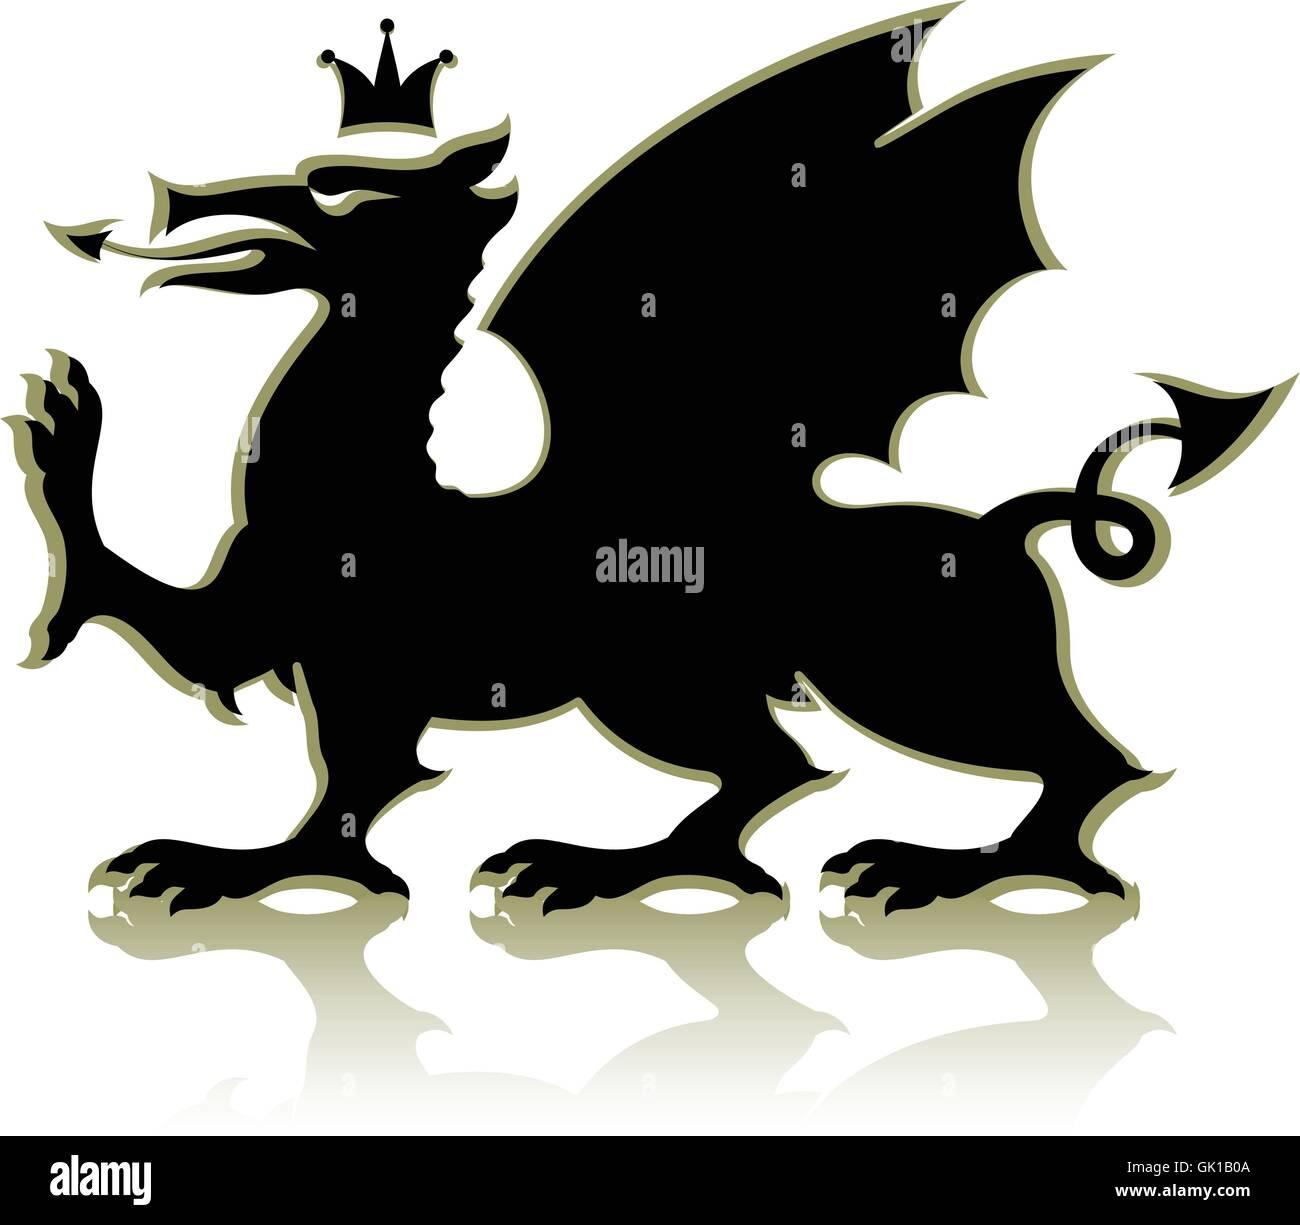 Dragon Illustration Medieval Stockfotos & Dragon Illustration ...